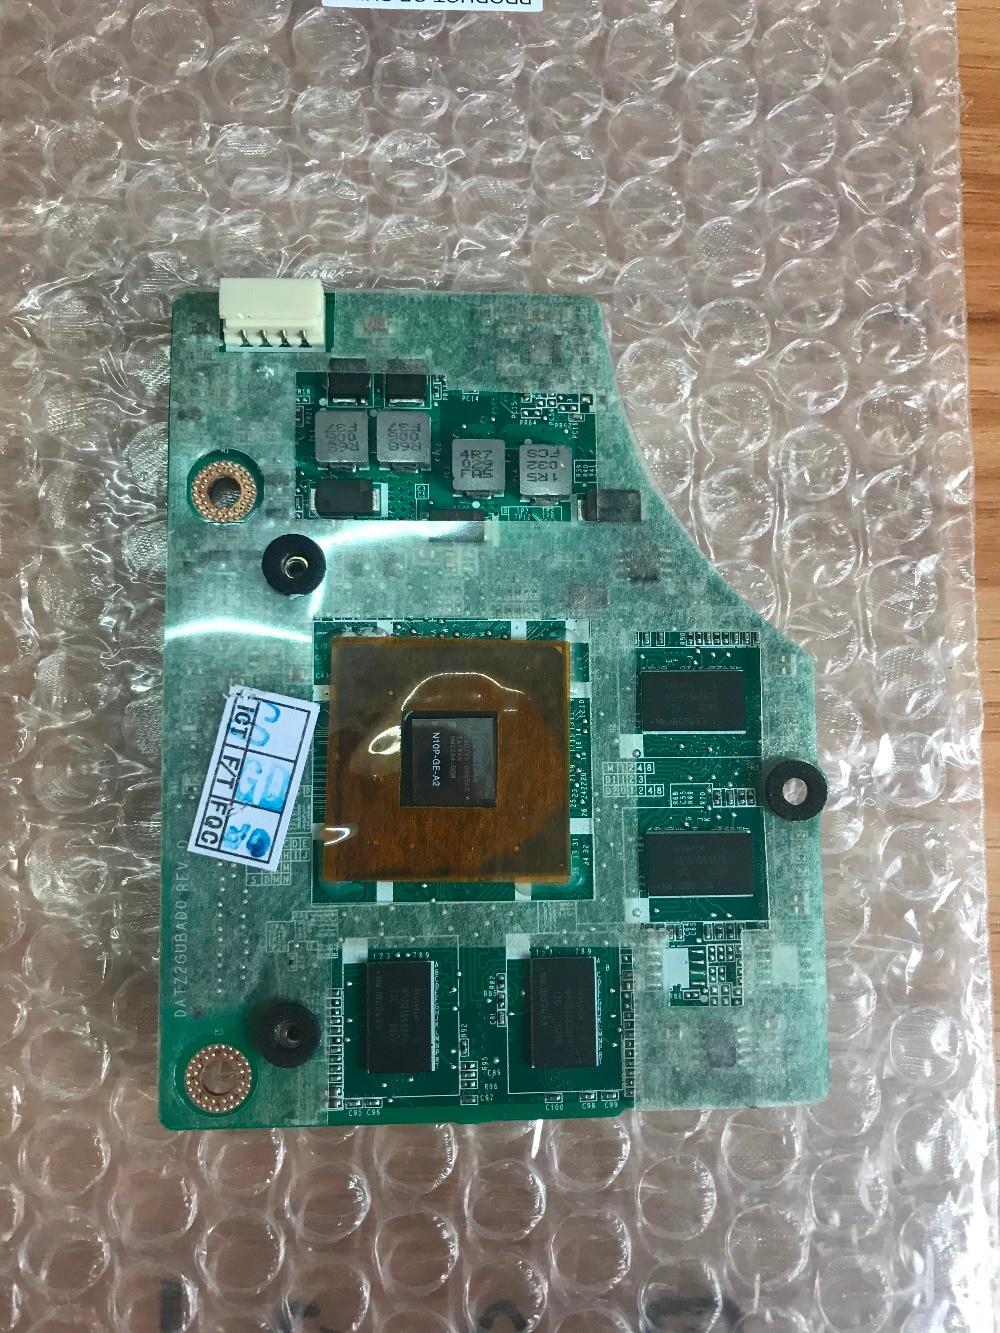 DATZ2GUBAD0 GT 230M GT230M N10P-GE-A2 DDR3 1 ГБ графическая карта для Toshiba Qosmio P500 P505D X500 x505 тест 100%